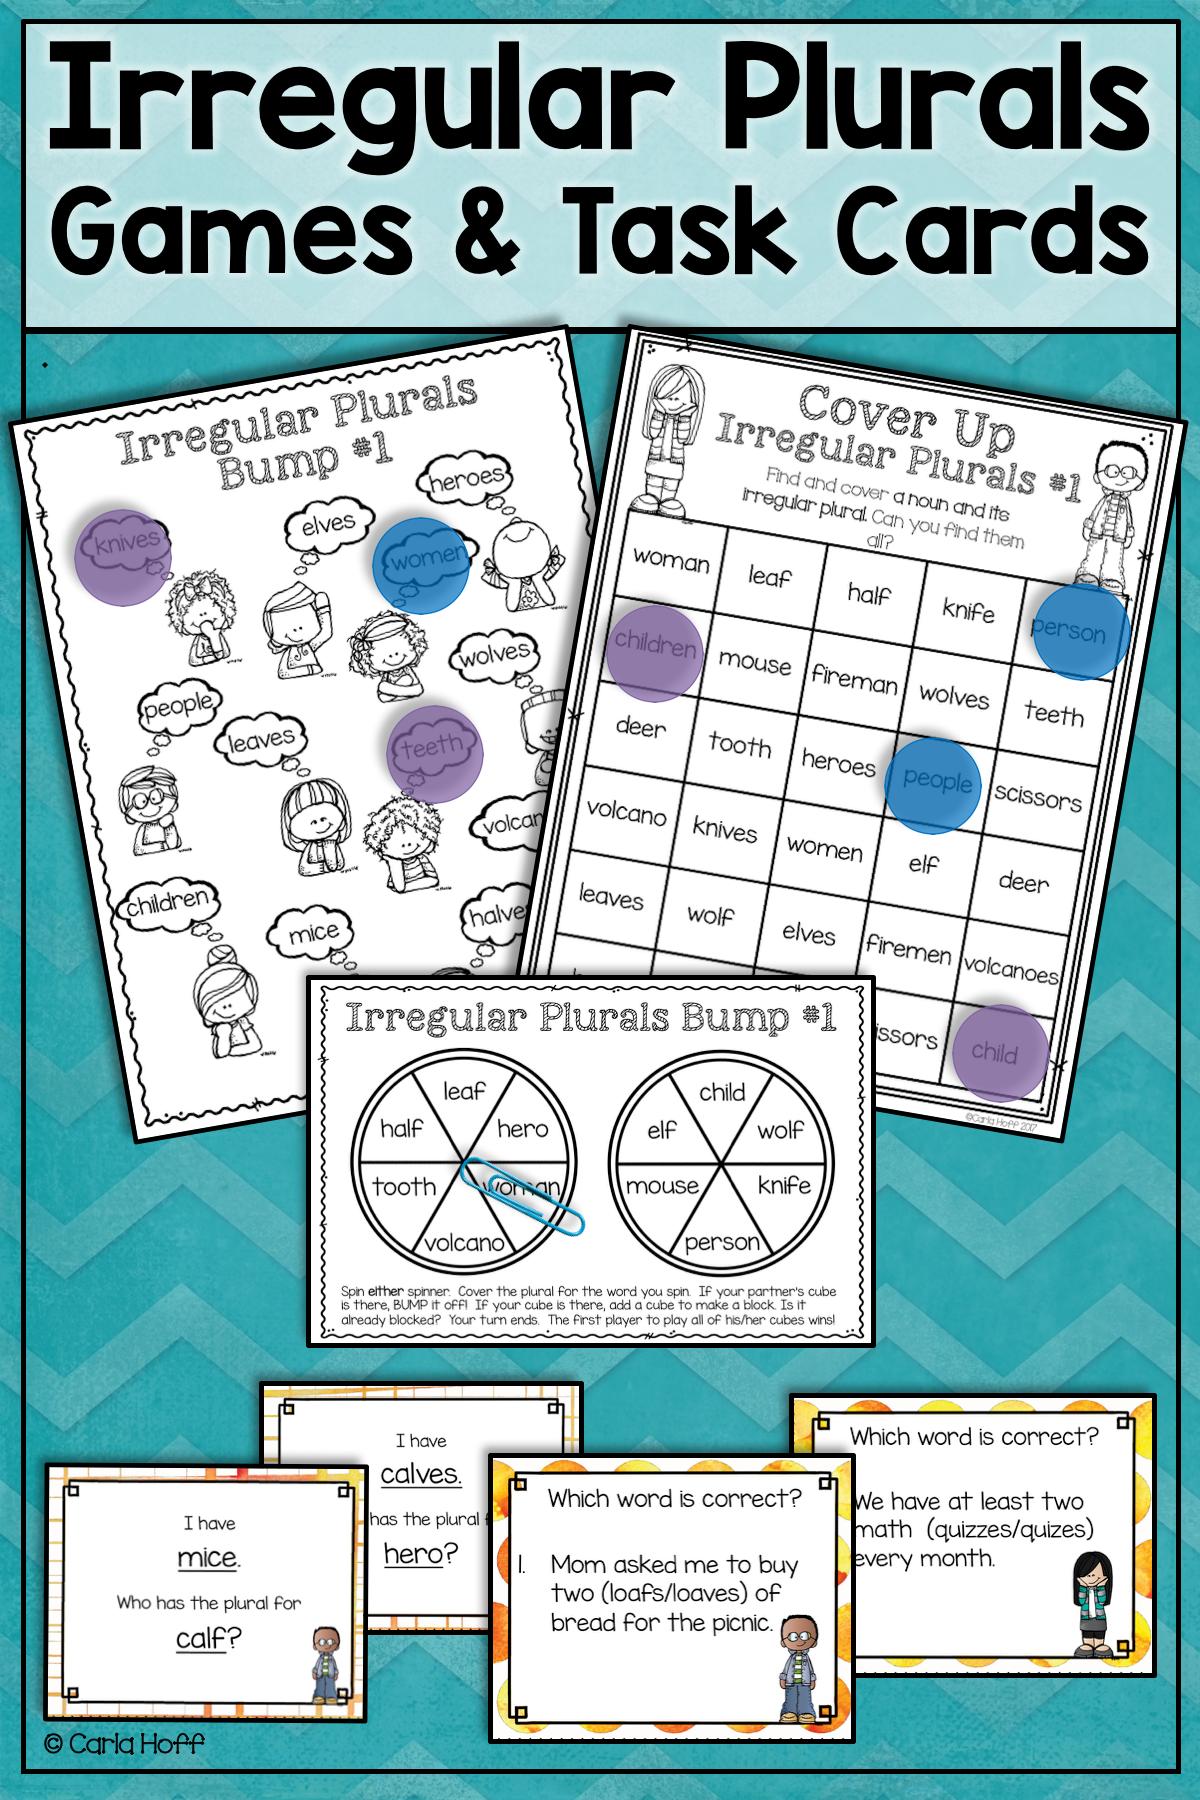 Irregular Plurals Task Cards And Games